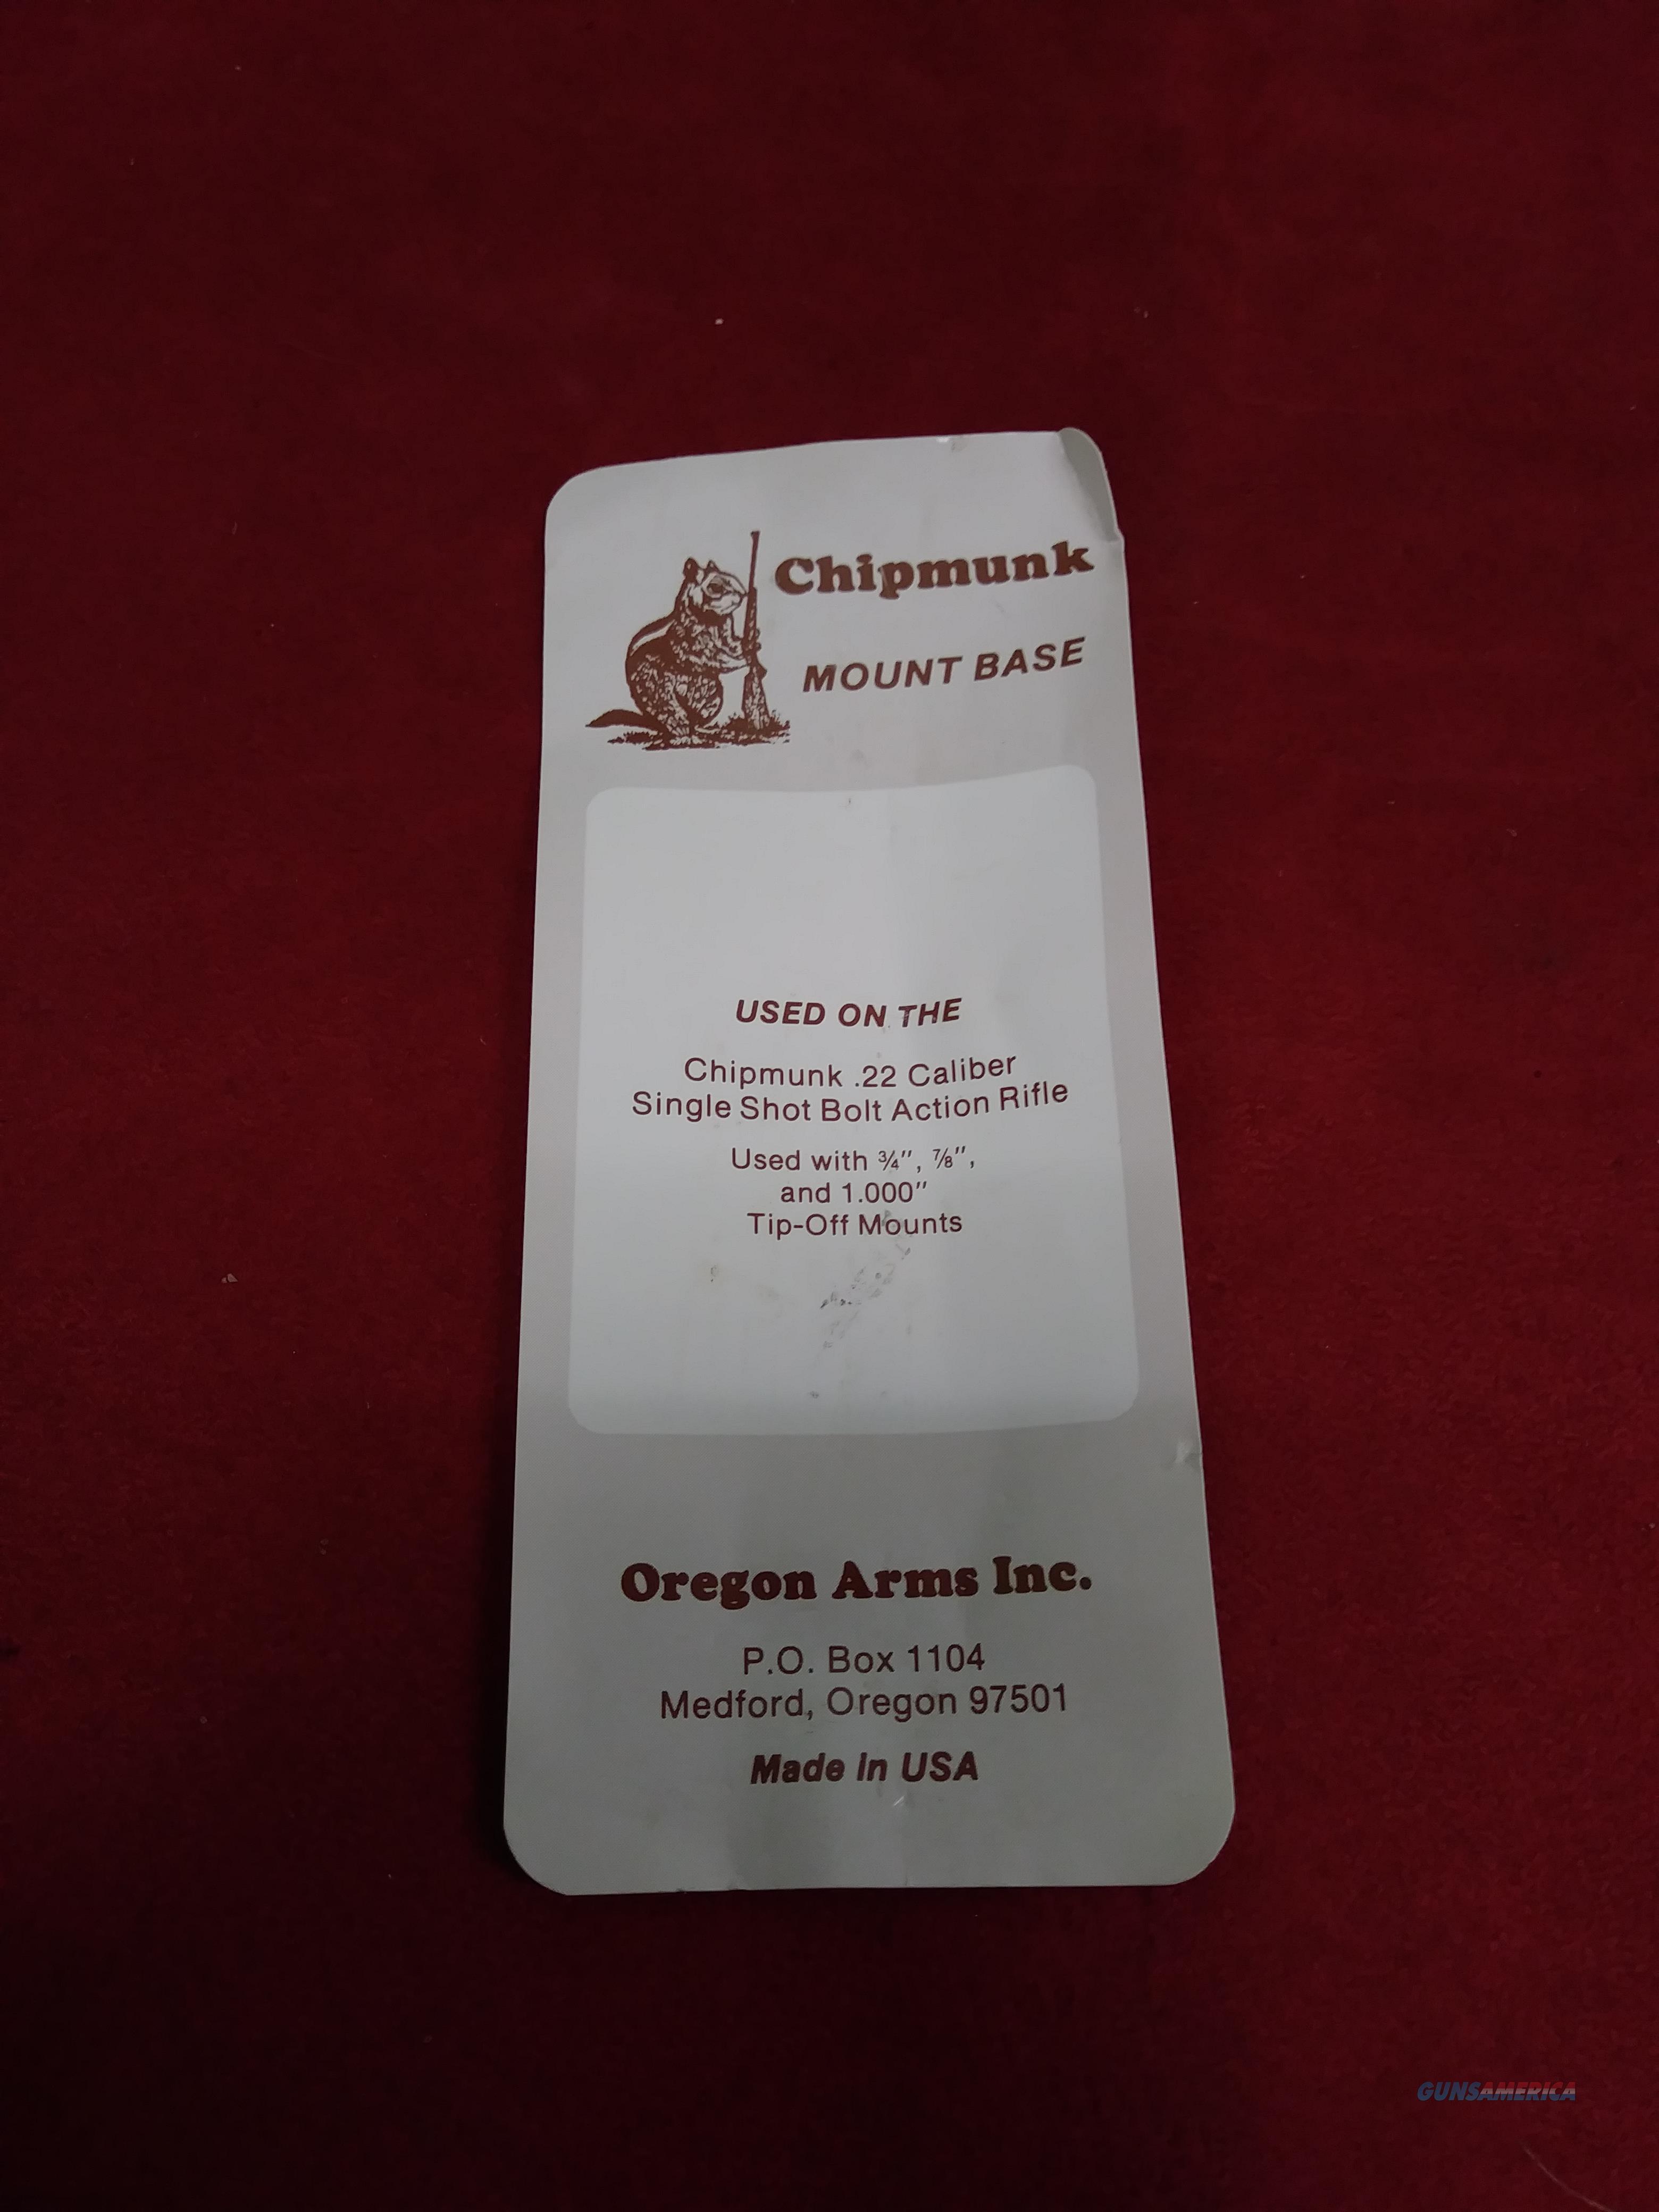 Chipmunk Mount Base  Non-Guns > Scopes/Mounts/Rings & Optics > Mounts > Traditional Weaver Style > Flat